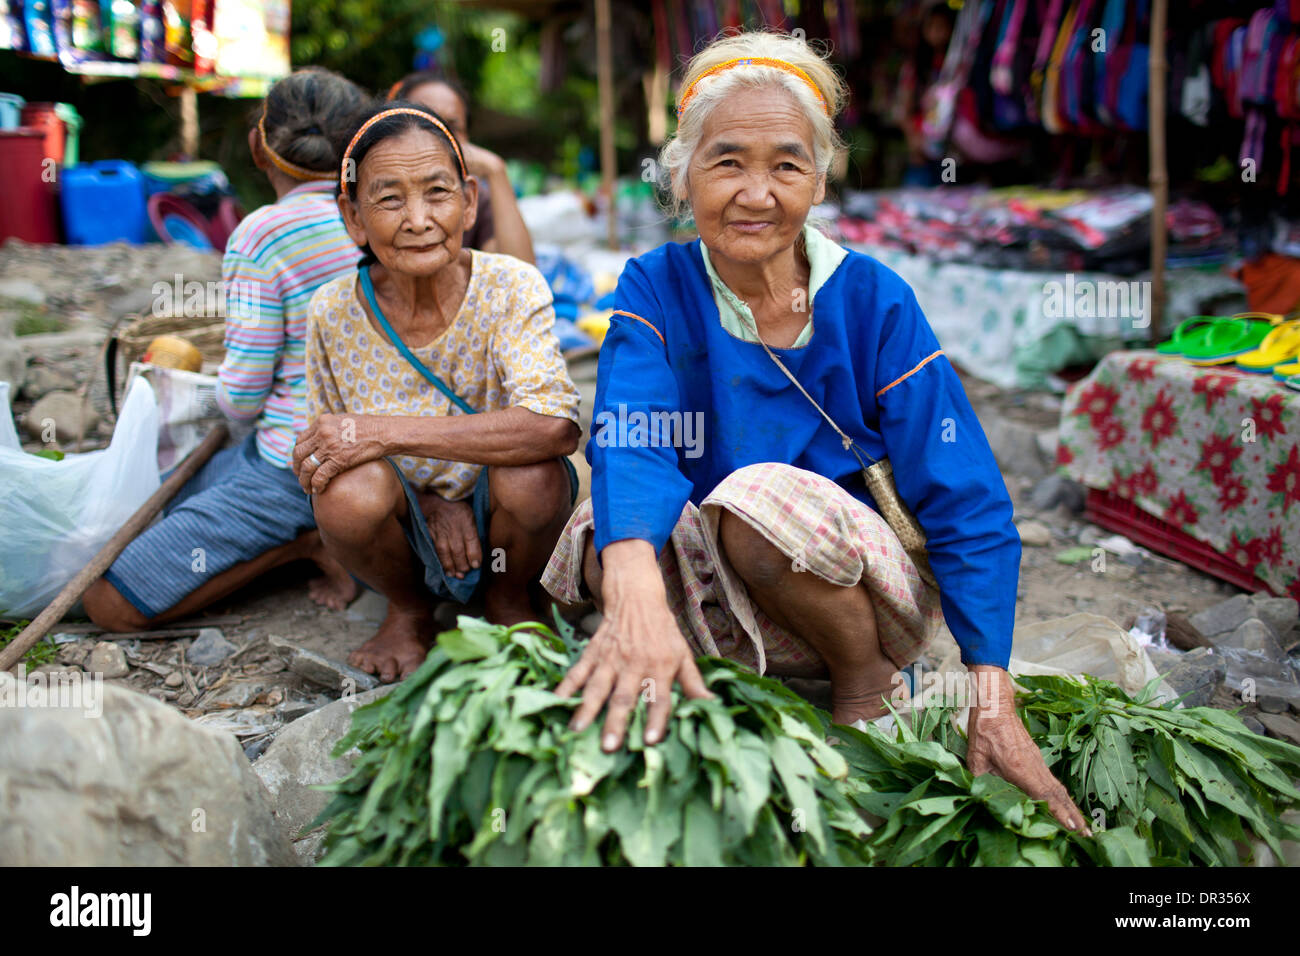 Hanunoo Mangyan women selling their crops at a Mangyan market near Mansalay, Oriental Mindoro, Philippines. Stock Photo